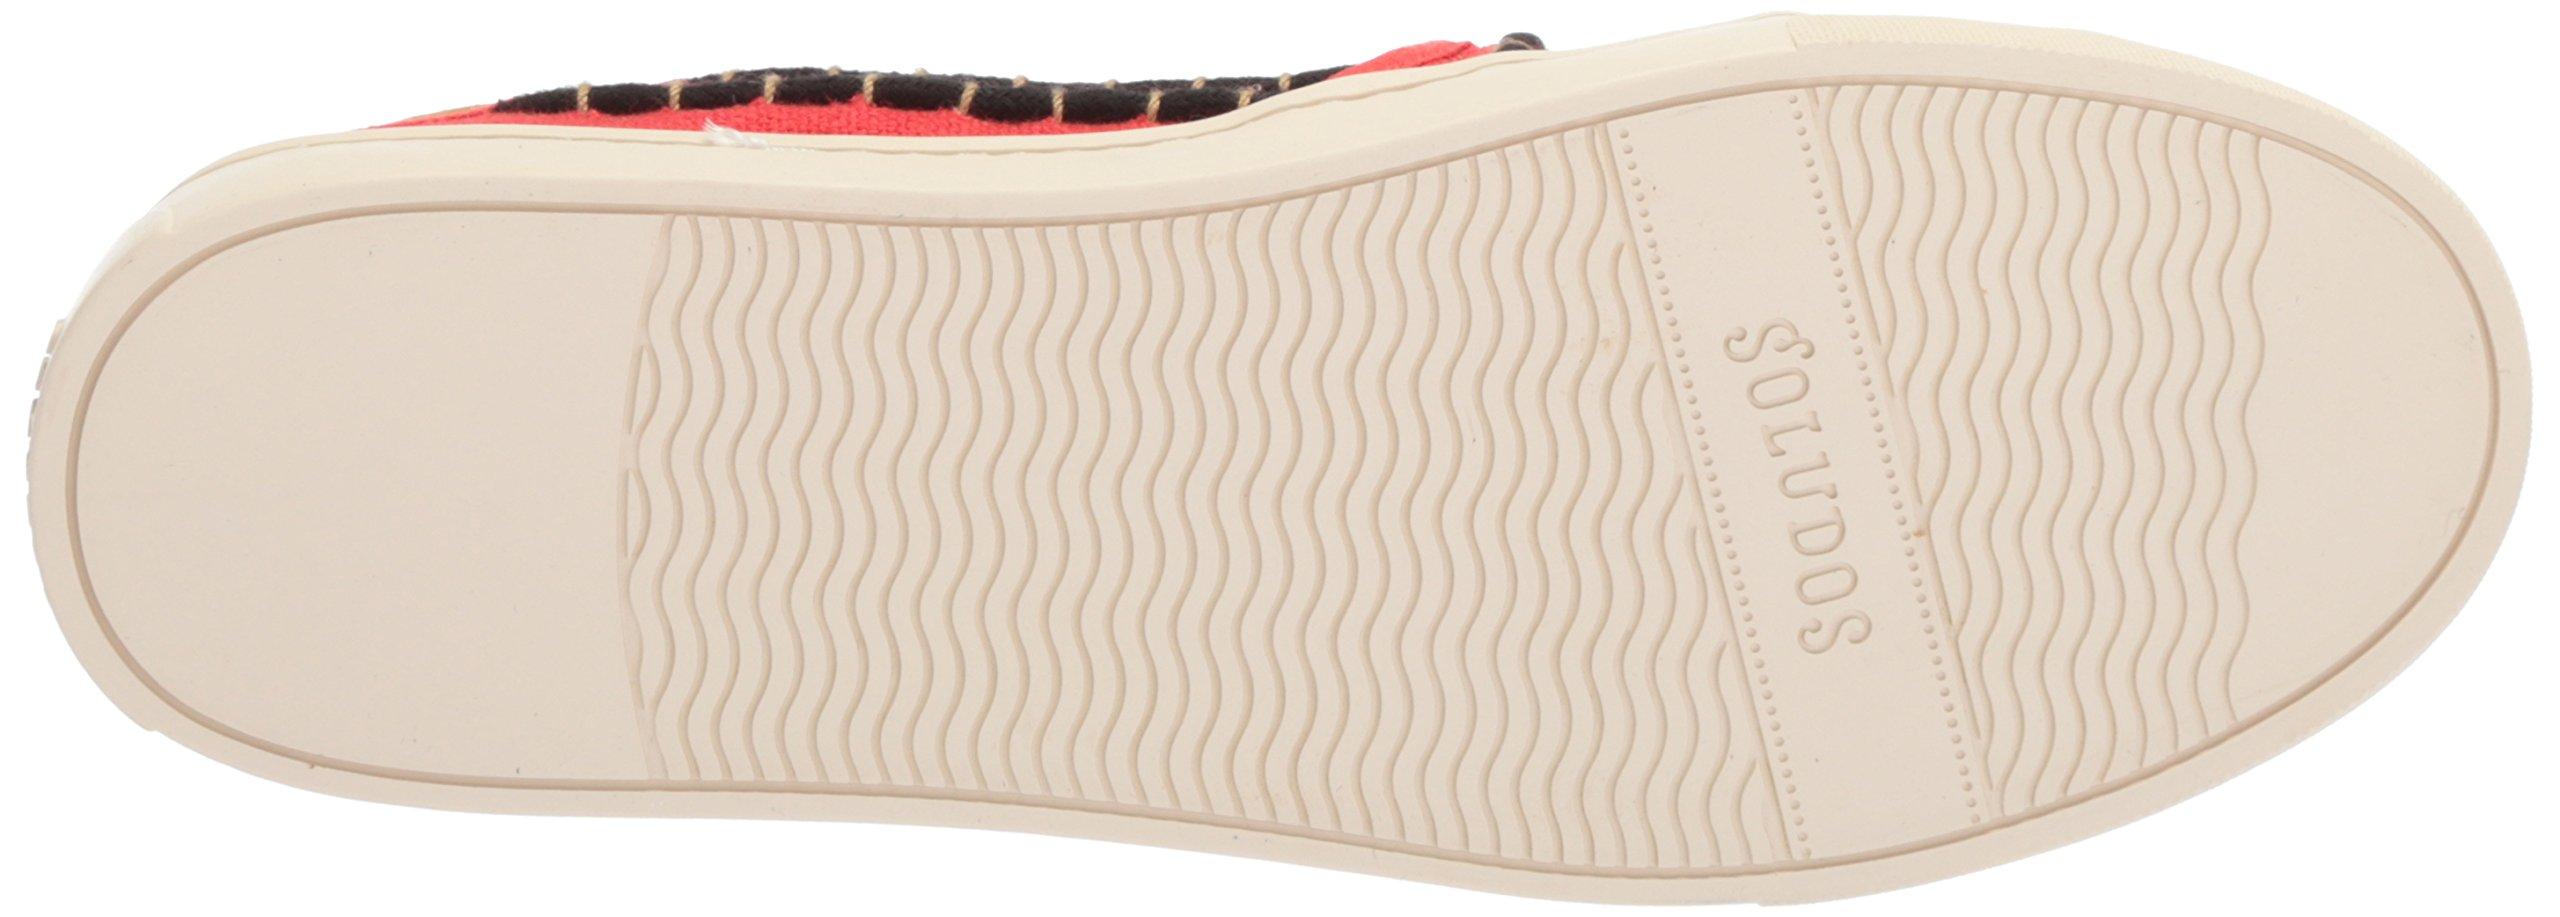 Soludos Women's Tassel Slip Sneaker, Red/Beige, 8 B US by Soludos (Image #3)